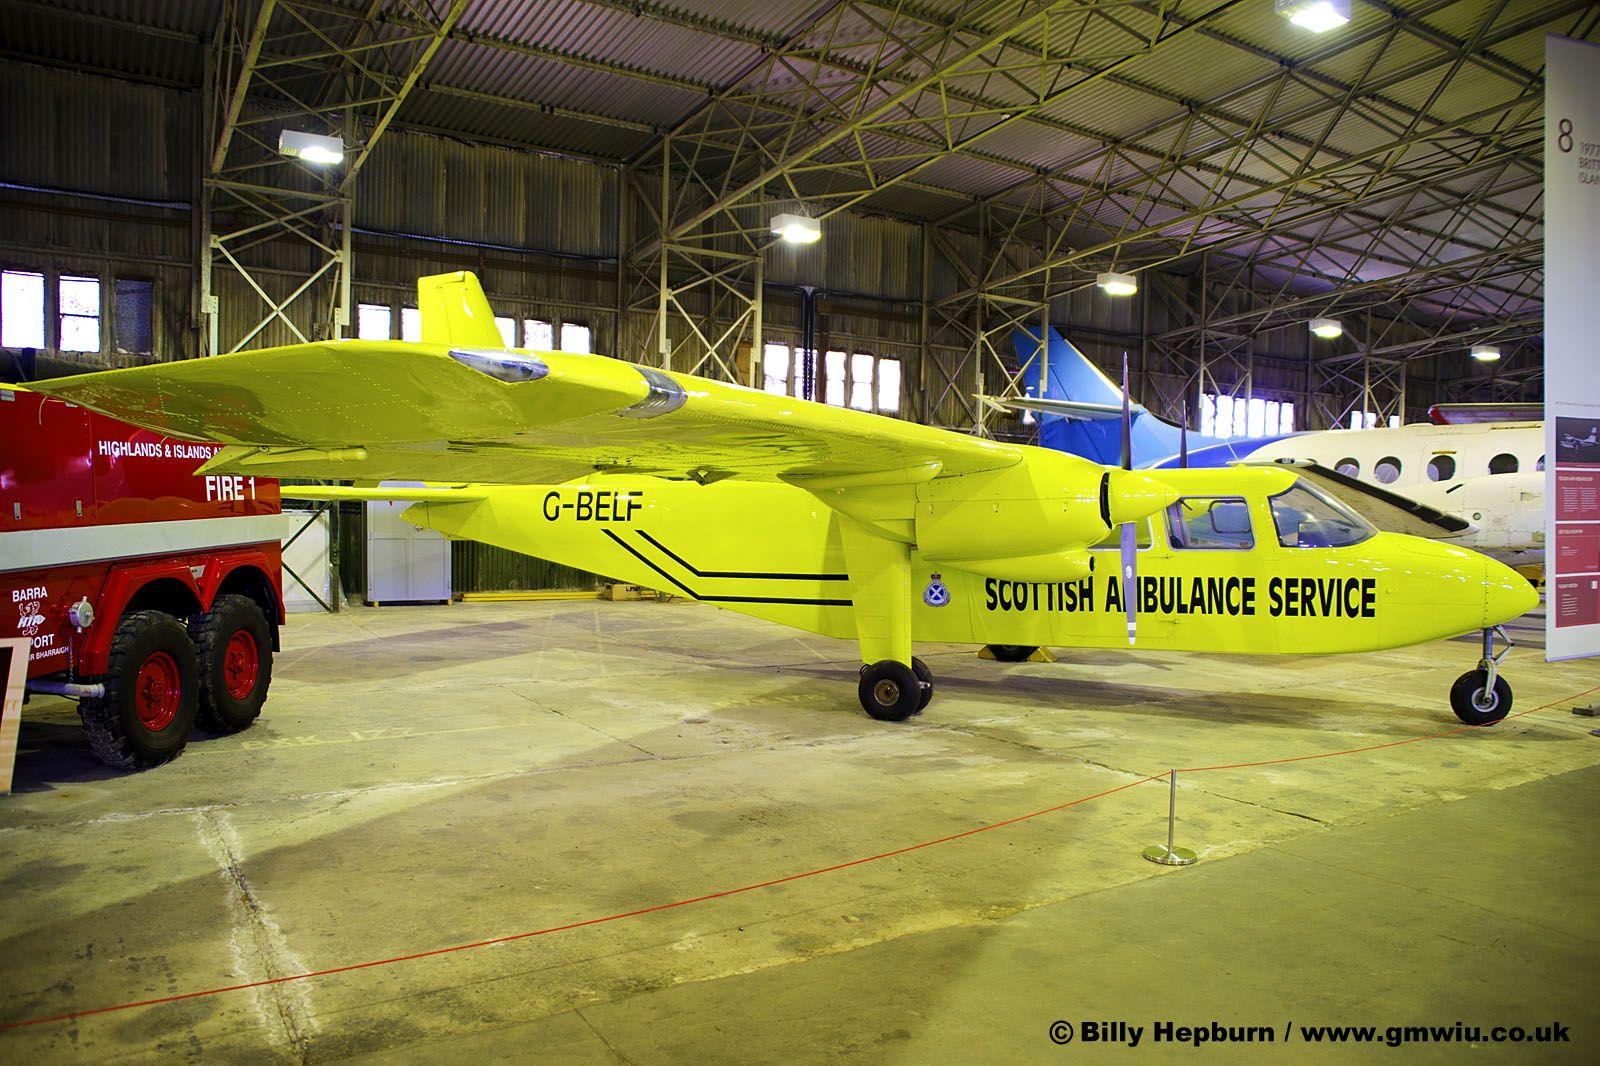 Britten-Norman Islander #aviation #aircraft #ga #twin piston #passenger #transport #uk